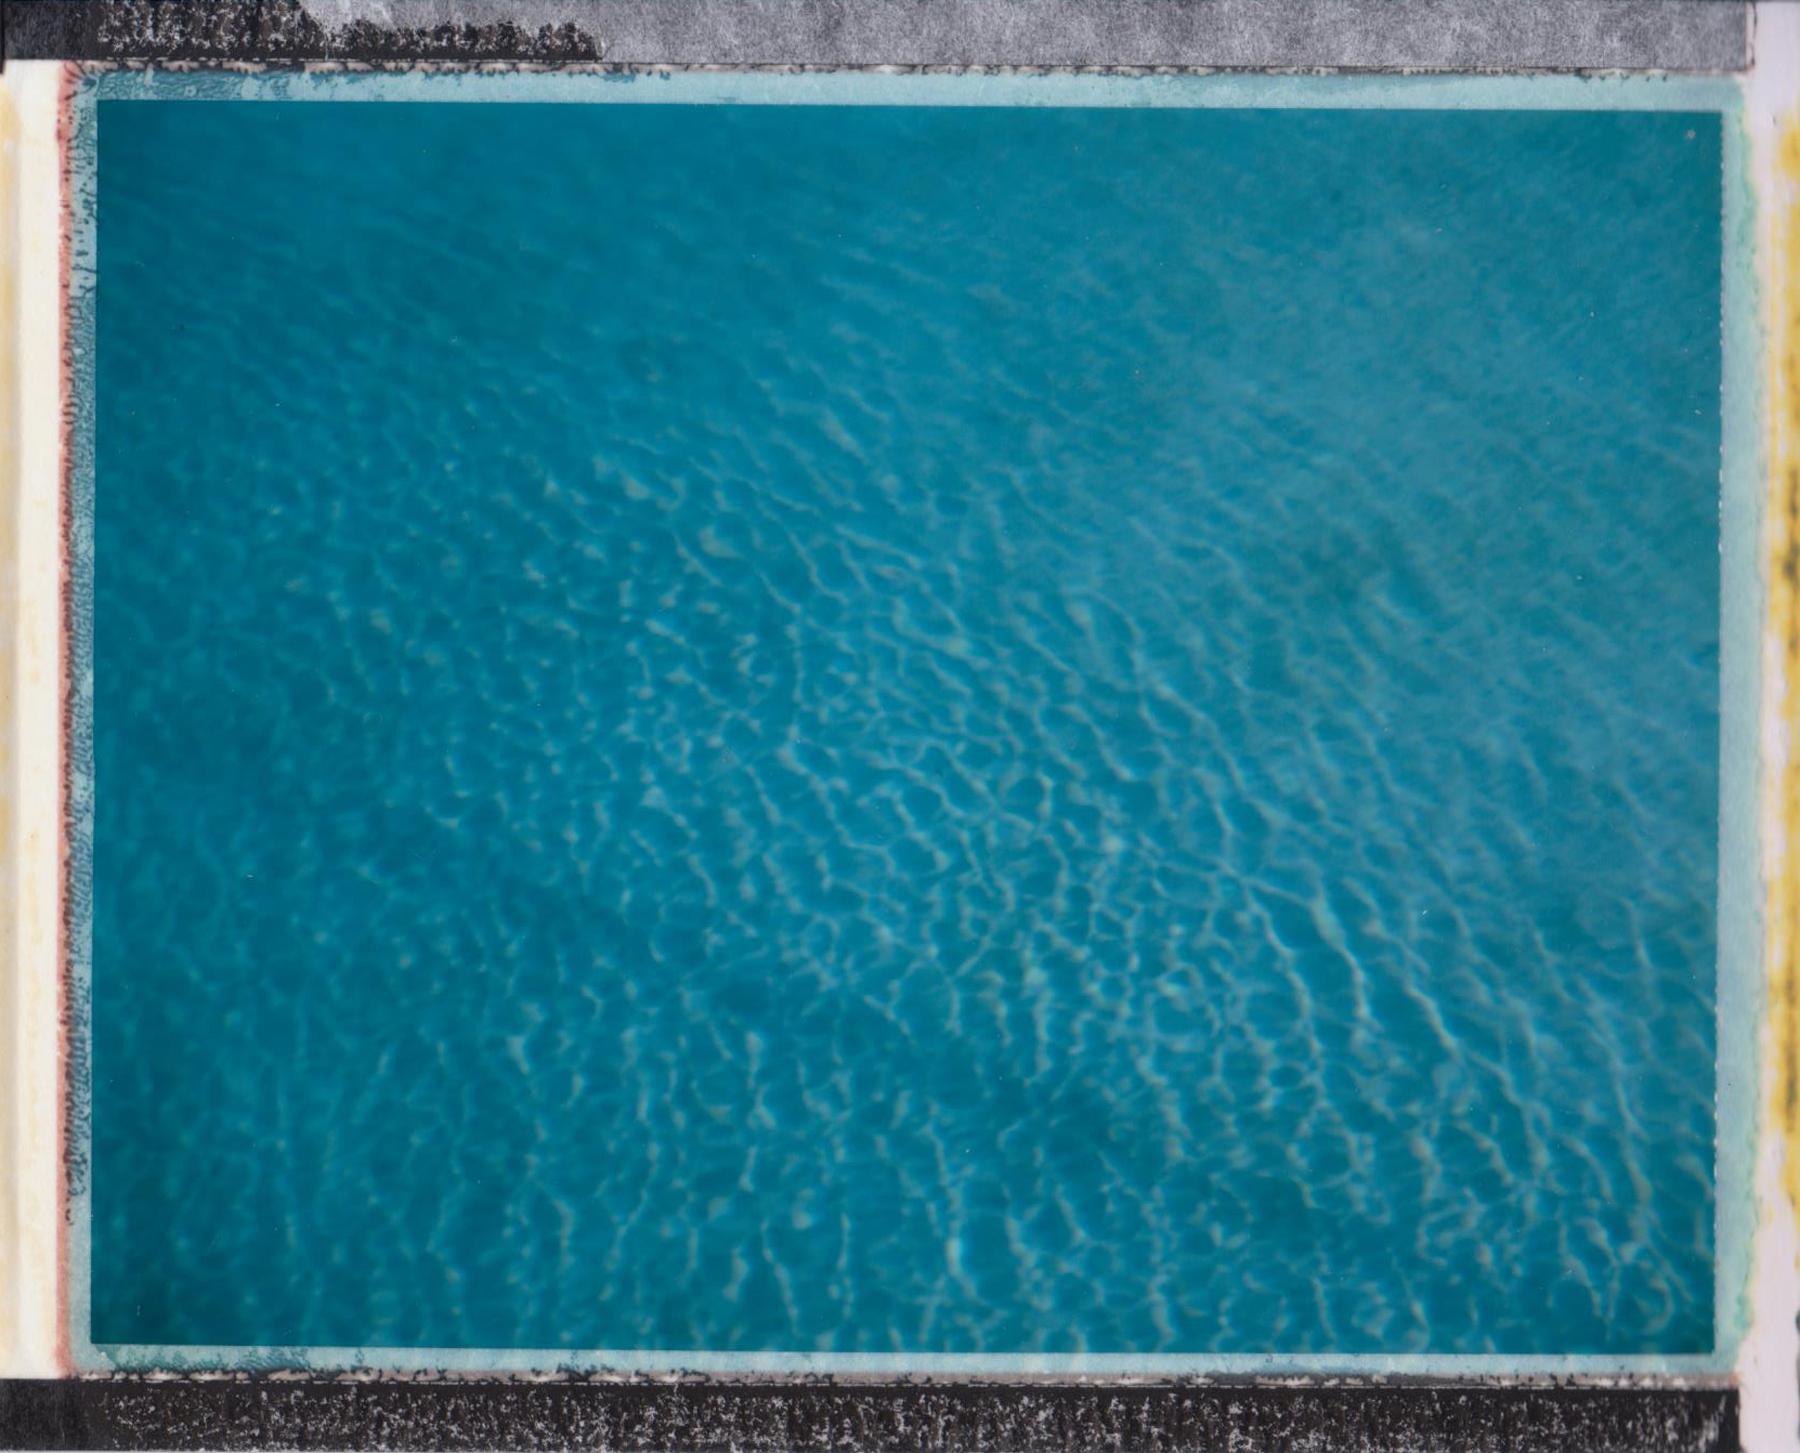 Pool I, Sylmar, California